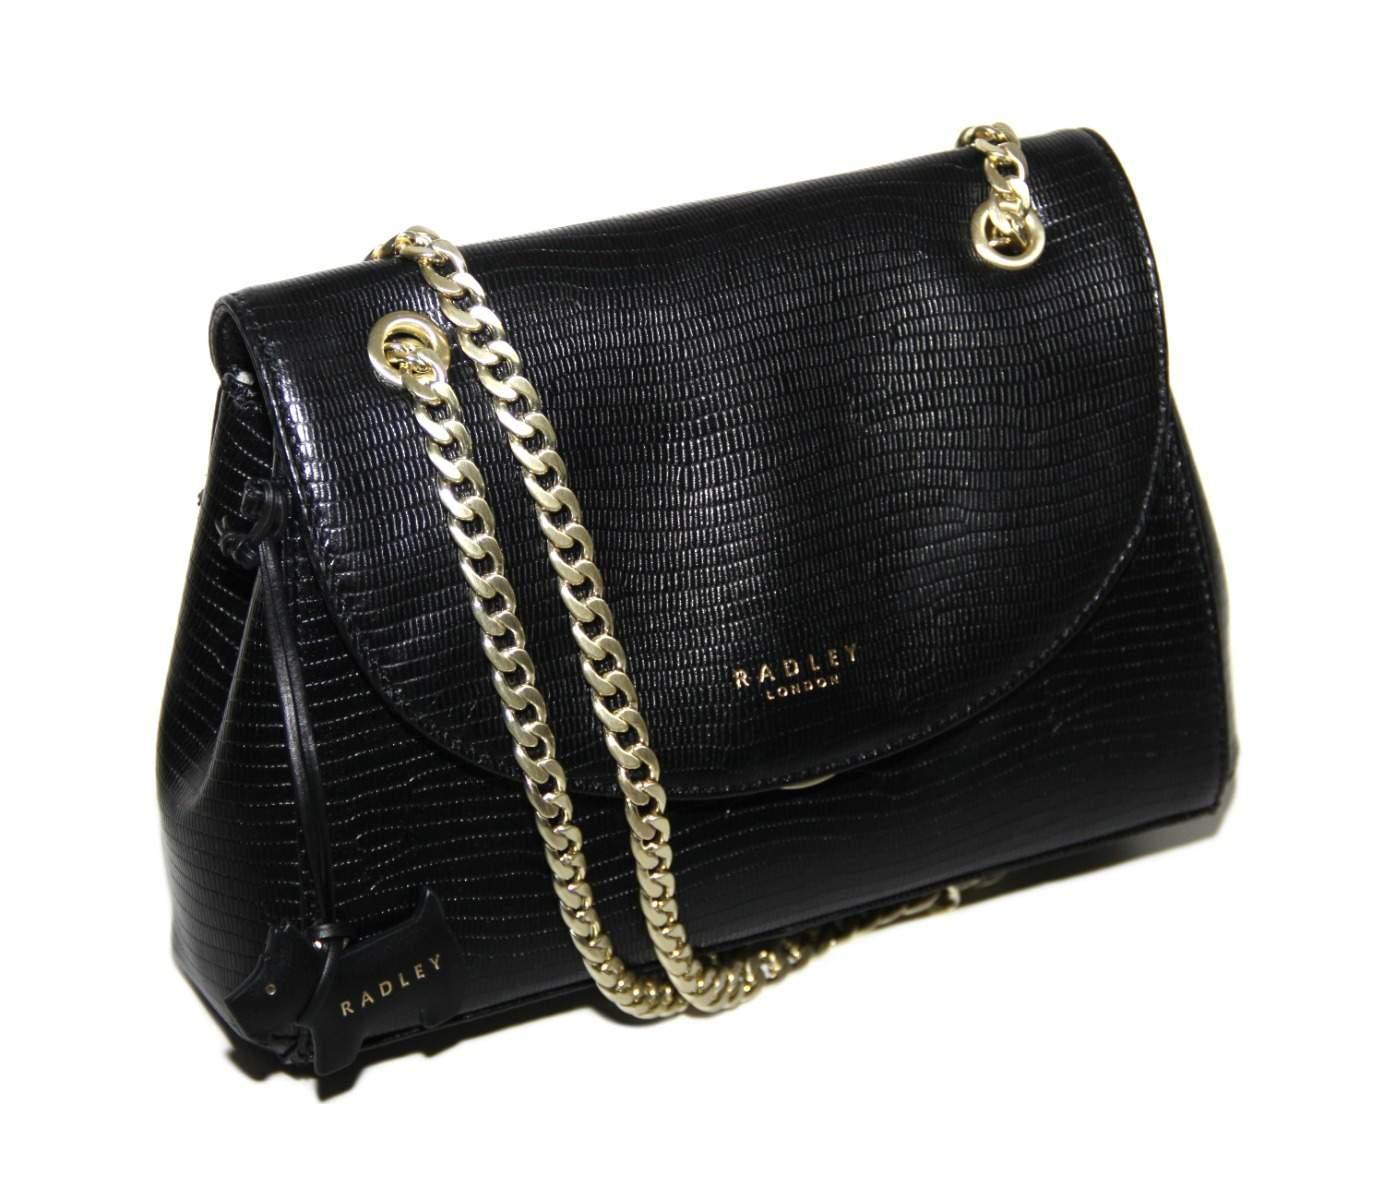 Details about Genuine Radley Womens Black Waterloo Medium Flapover Cross Body Bag Handbag